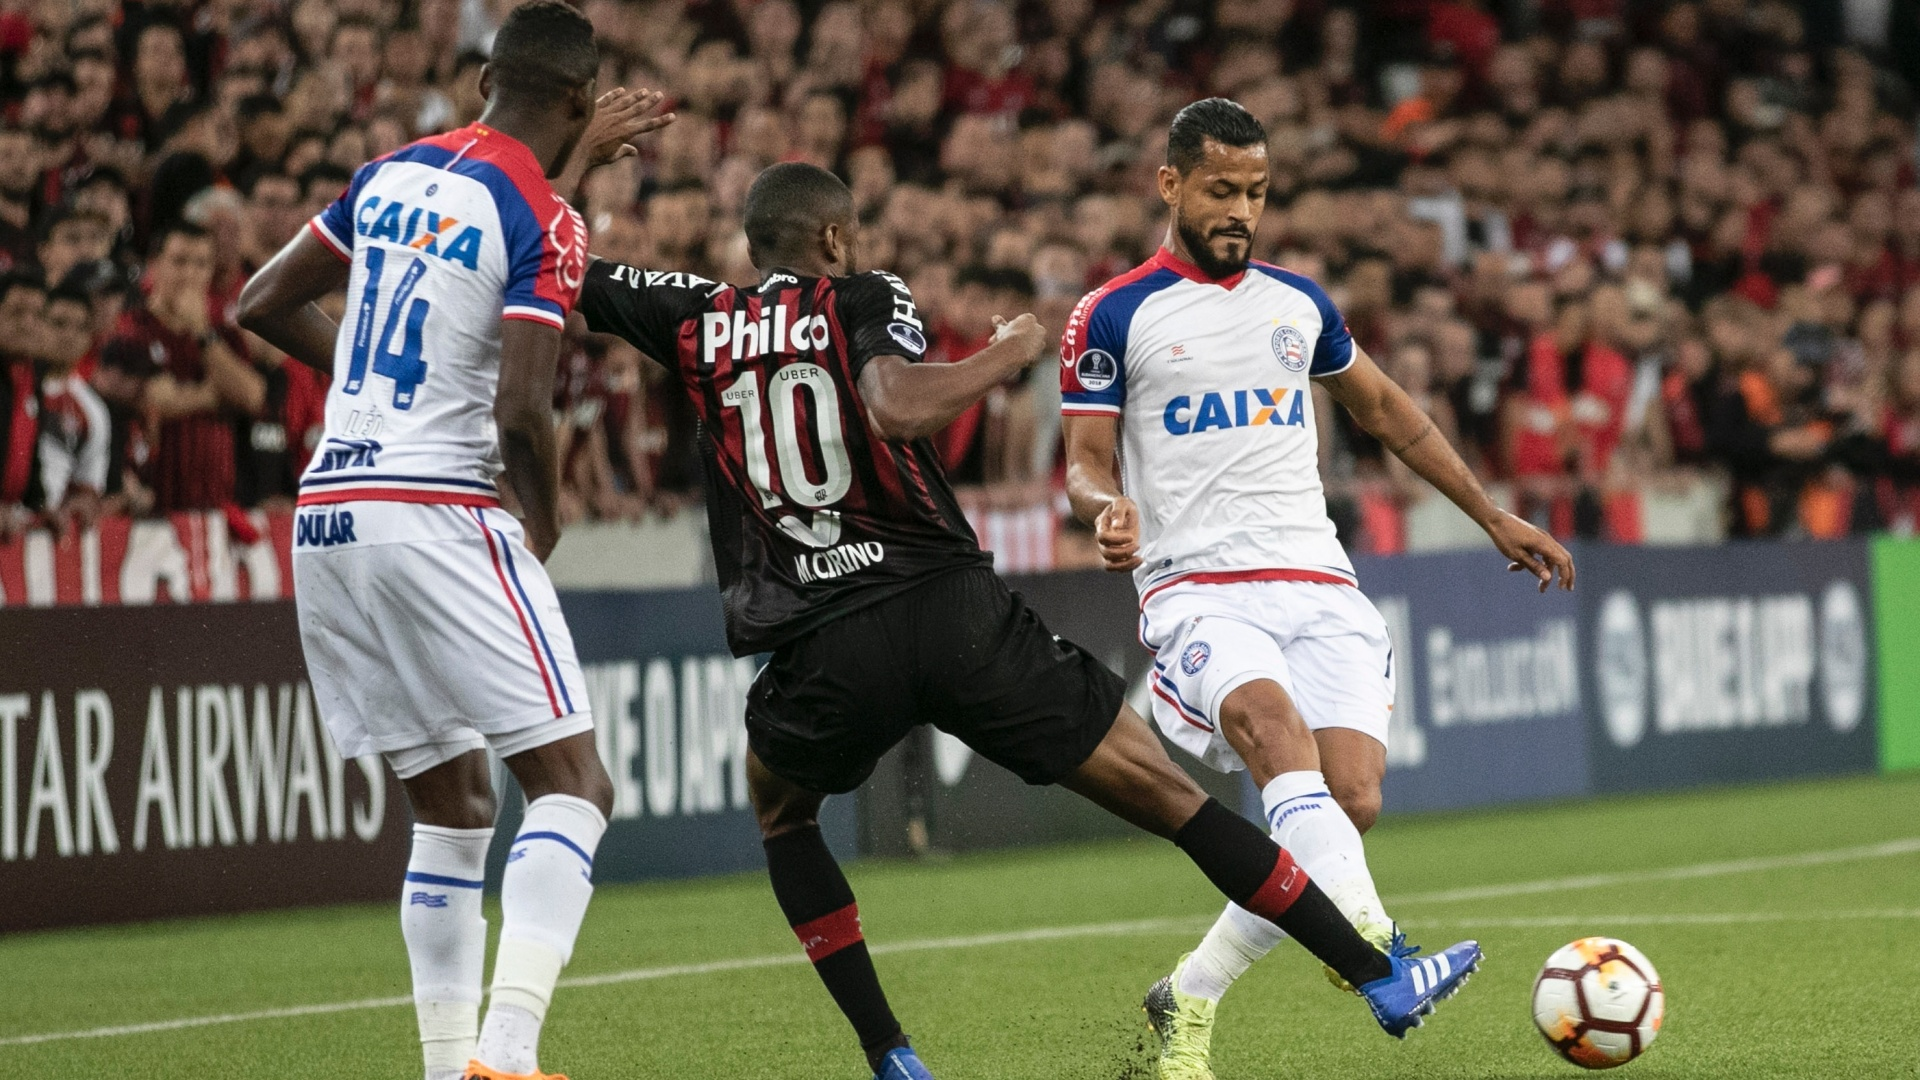 Marcelo Cirino e Léo, durante jogo entre Atlético-PR e Bahia